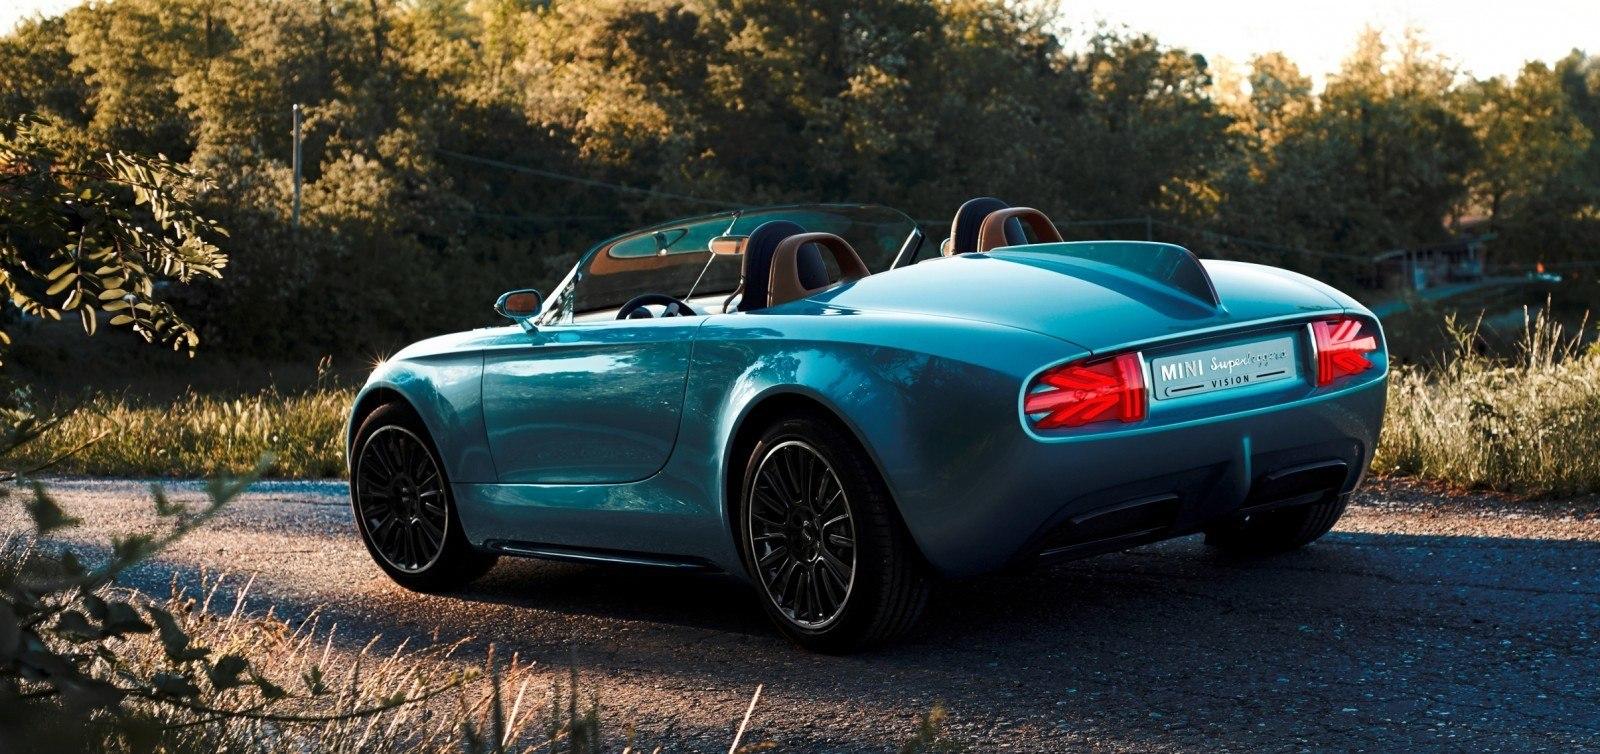 2014 MINI Superleggera Concept is Dreamy Roofless Speedster4